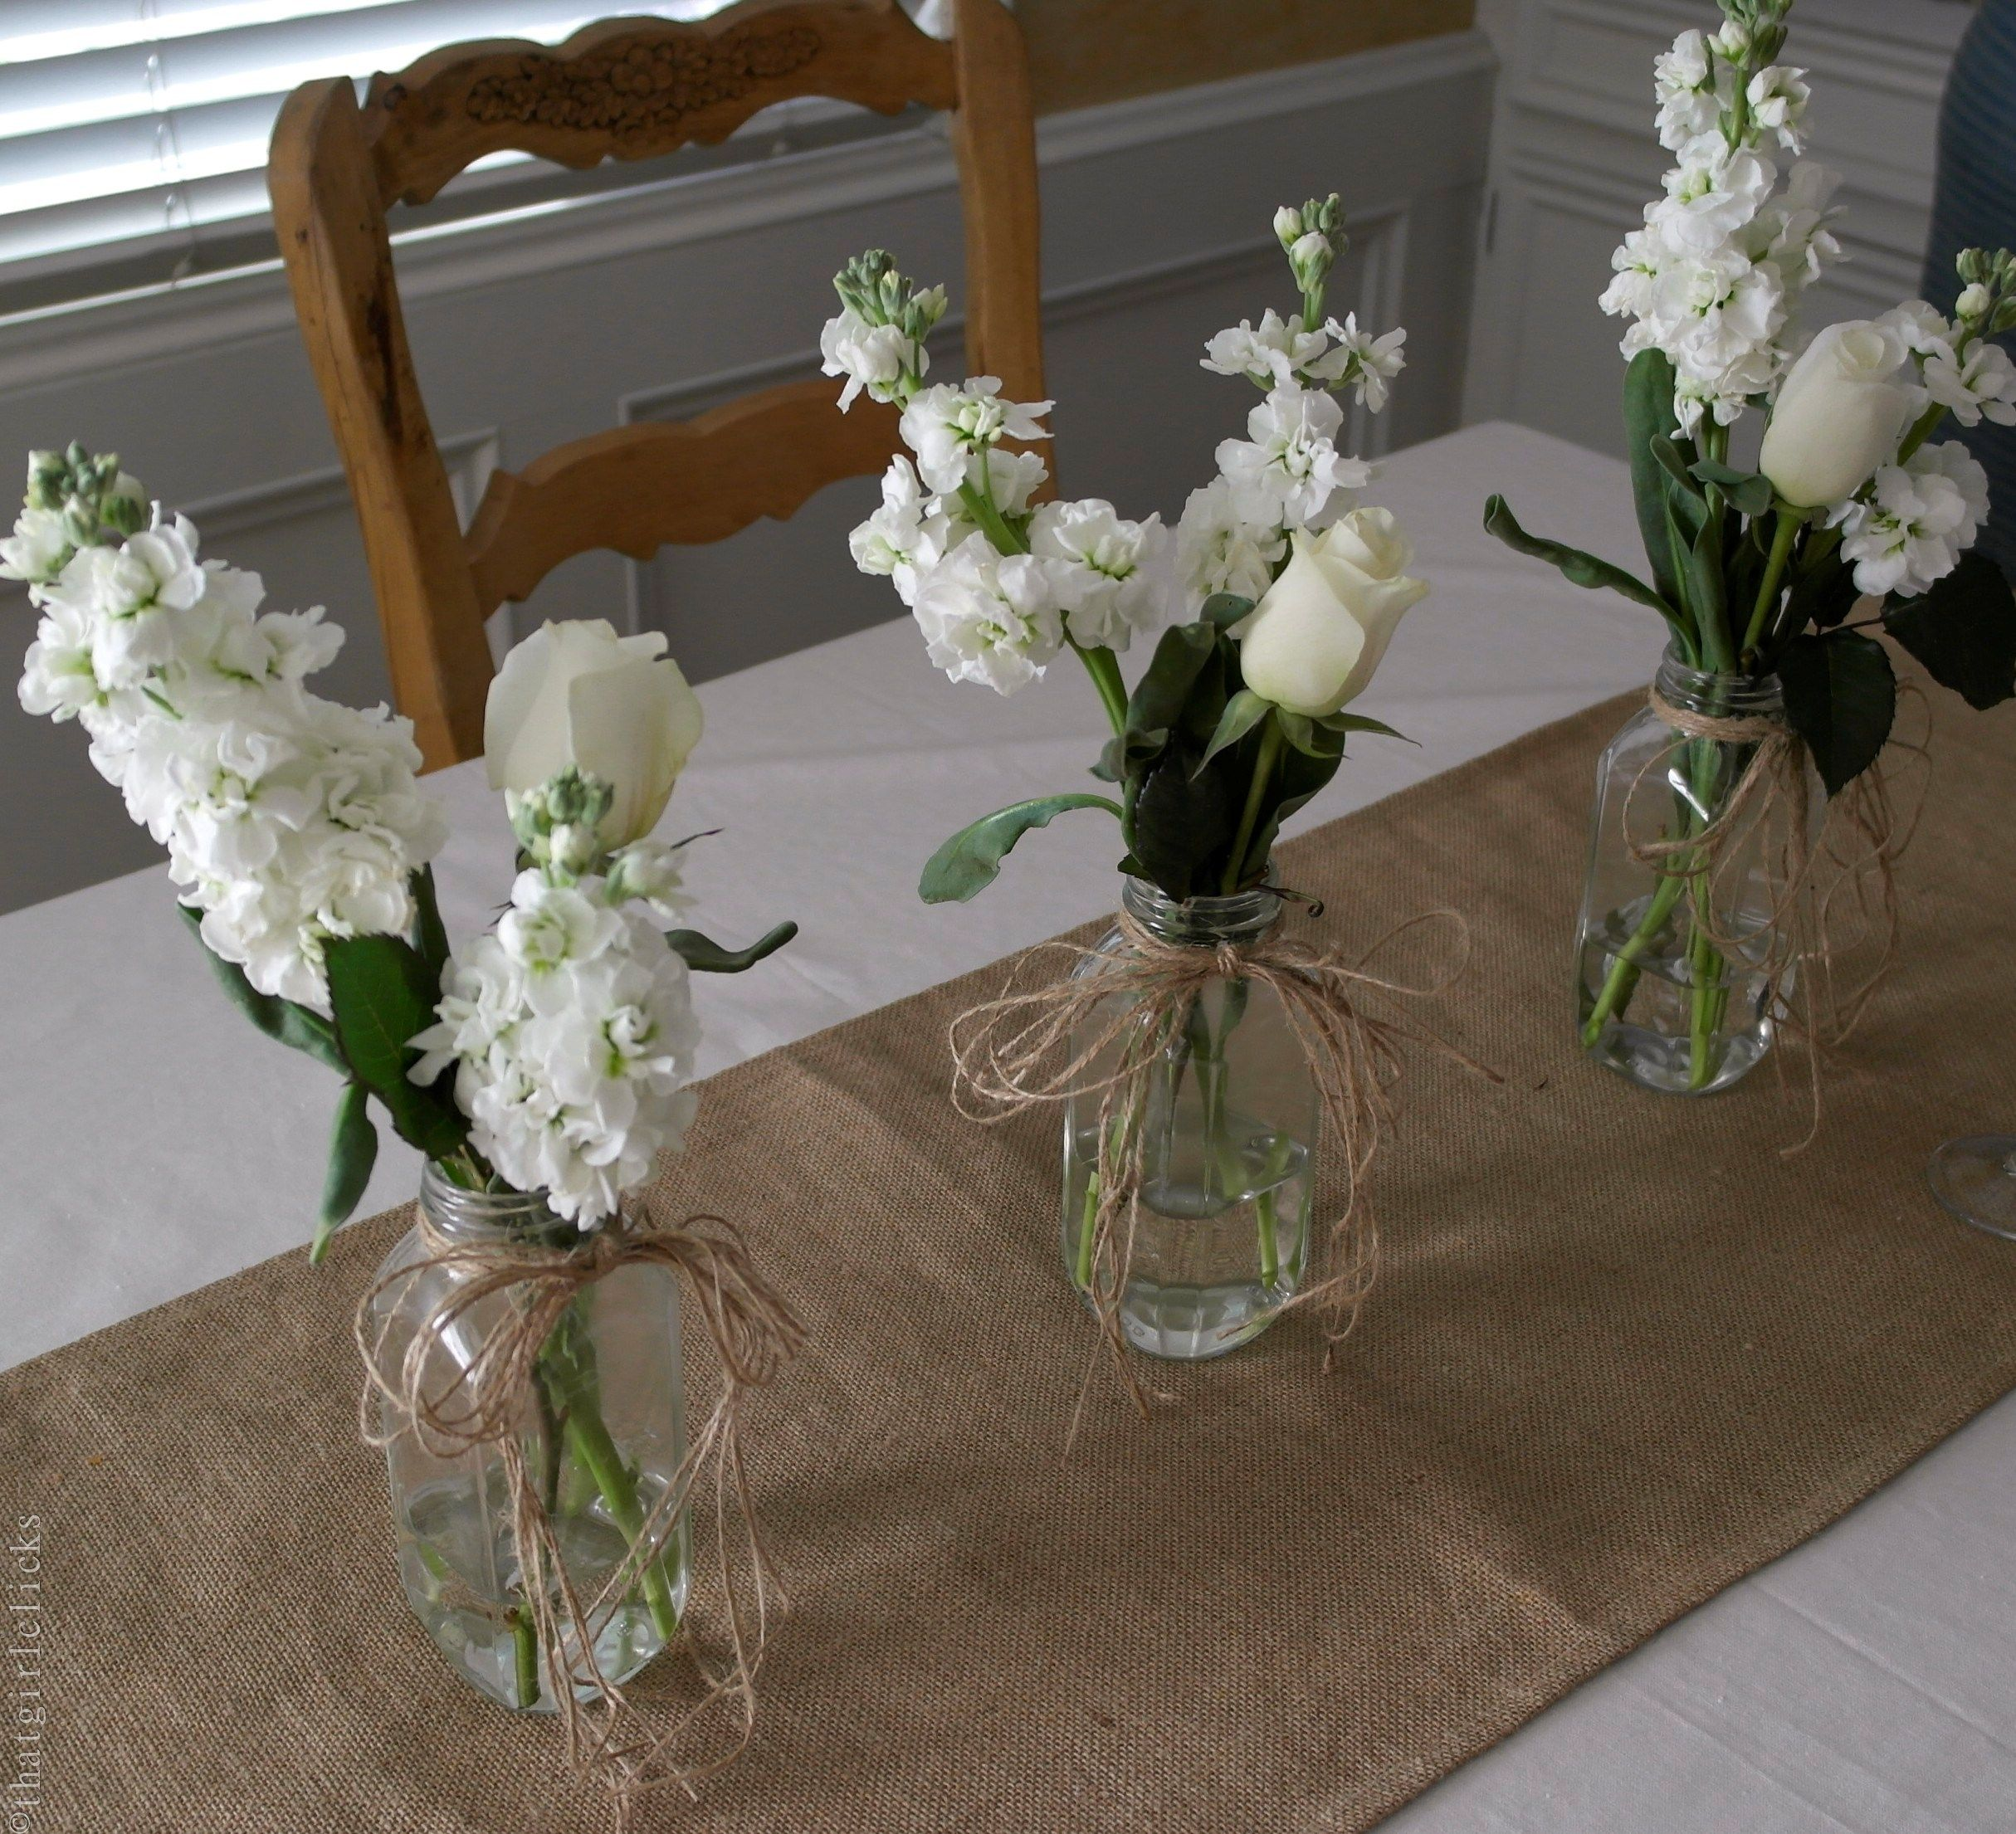 25 Best Ideas About Kitchen Table Centerpieces On: Best 25+ Bridal Shower Tables Ideas On Pinterest